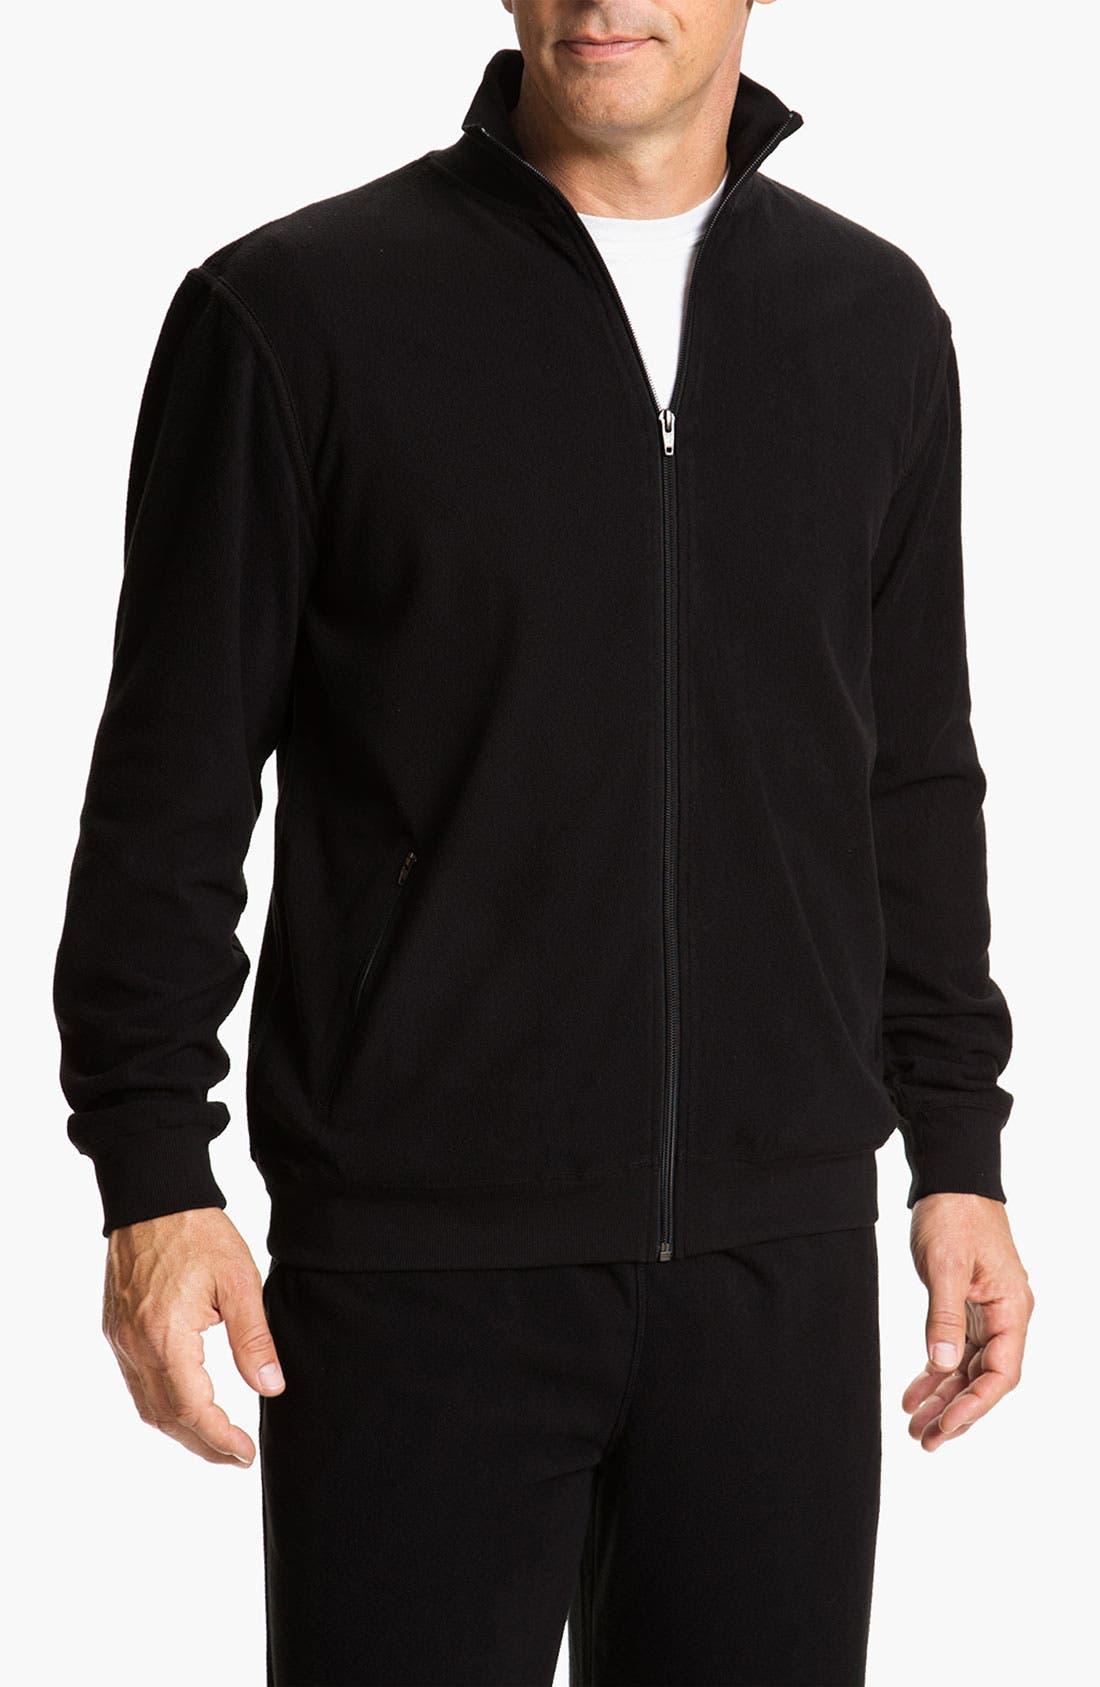 Alternate Image 1 Selected - Daniel Buchler Lightweight Fleece Track Jacket